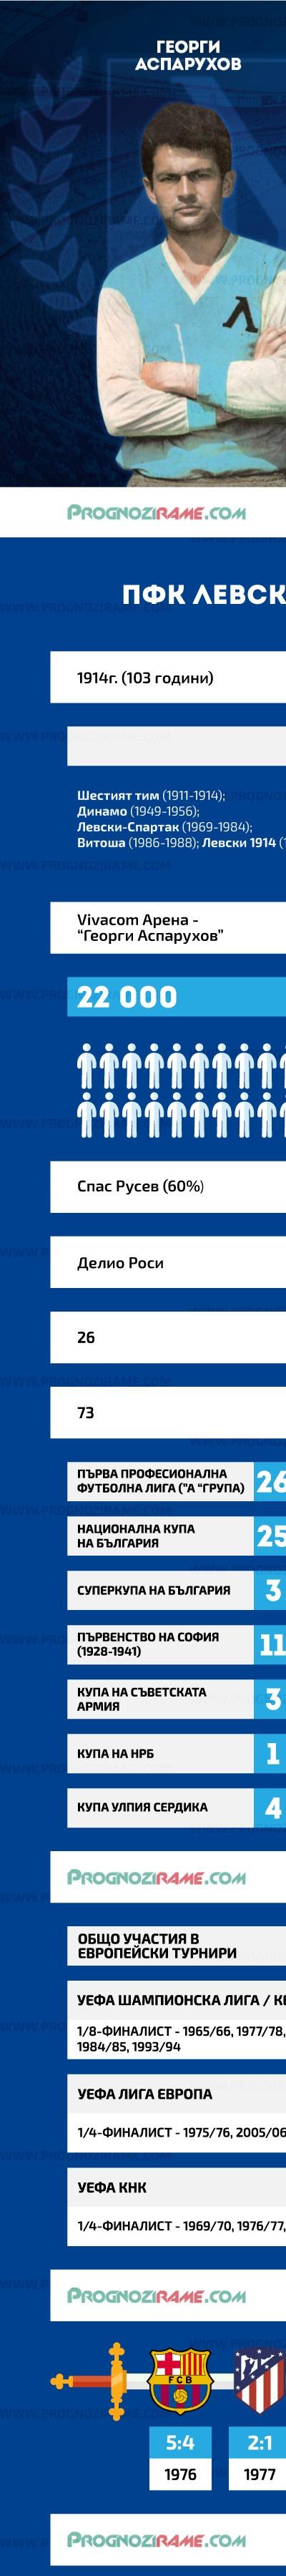 Левски срещу ЦСКА - prognozirame.com [1]